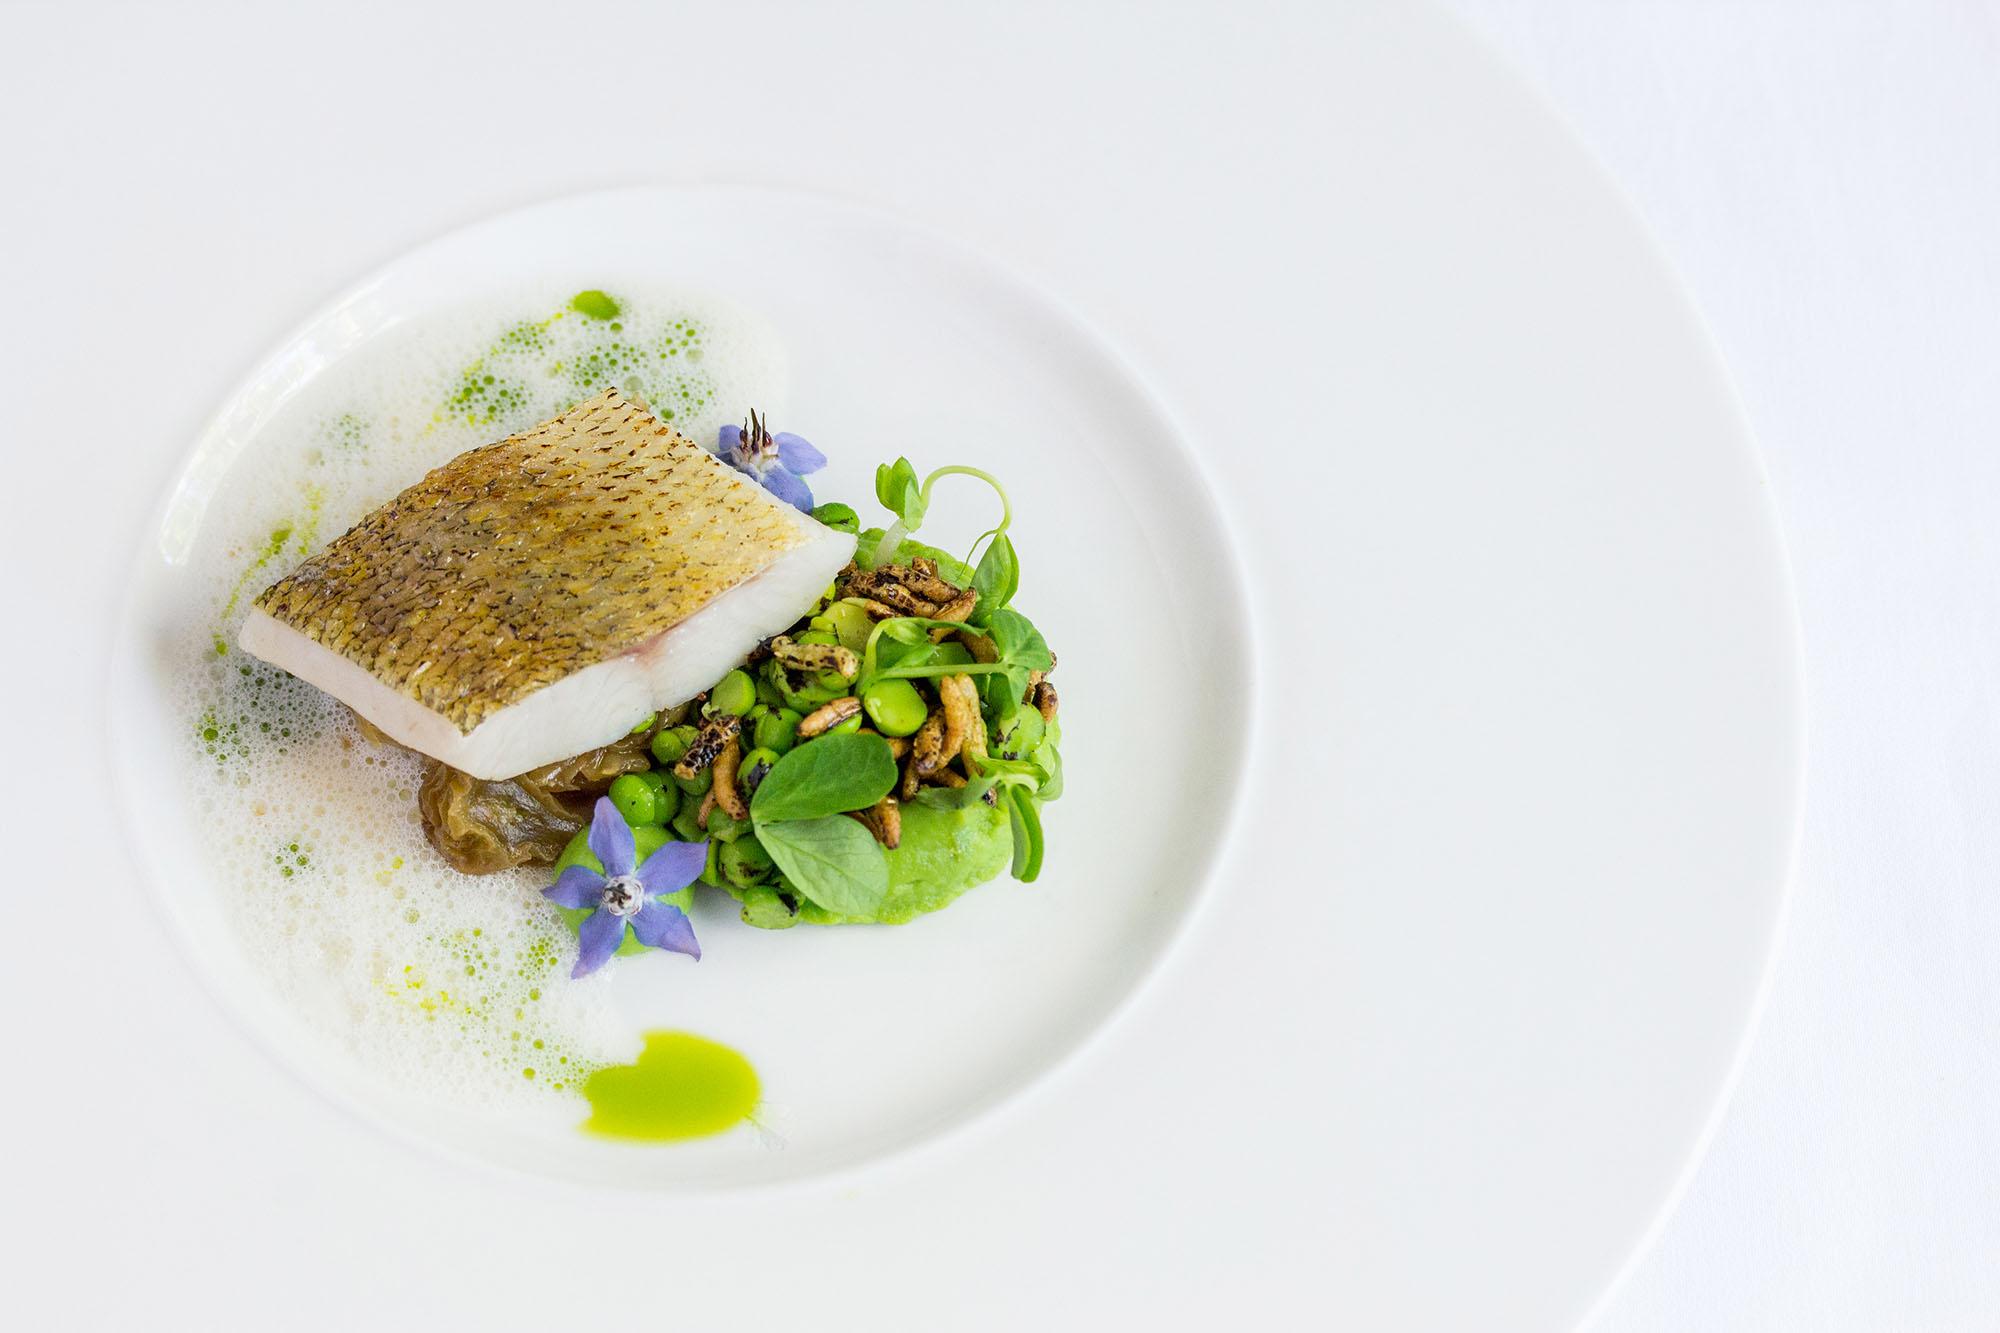 Auberge du Pommier cod dish from tasting menu